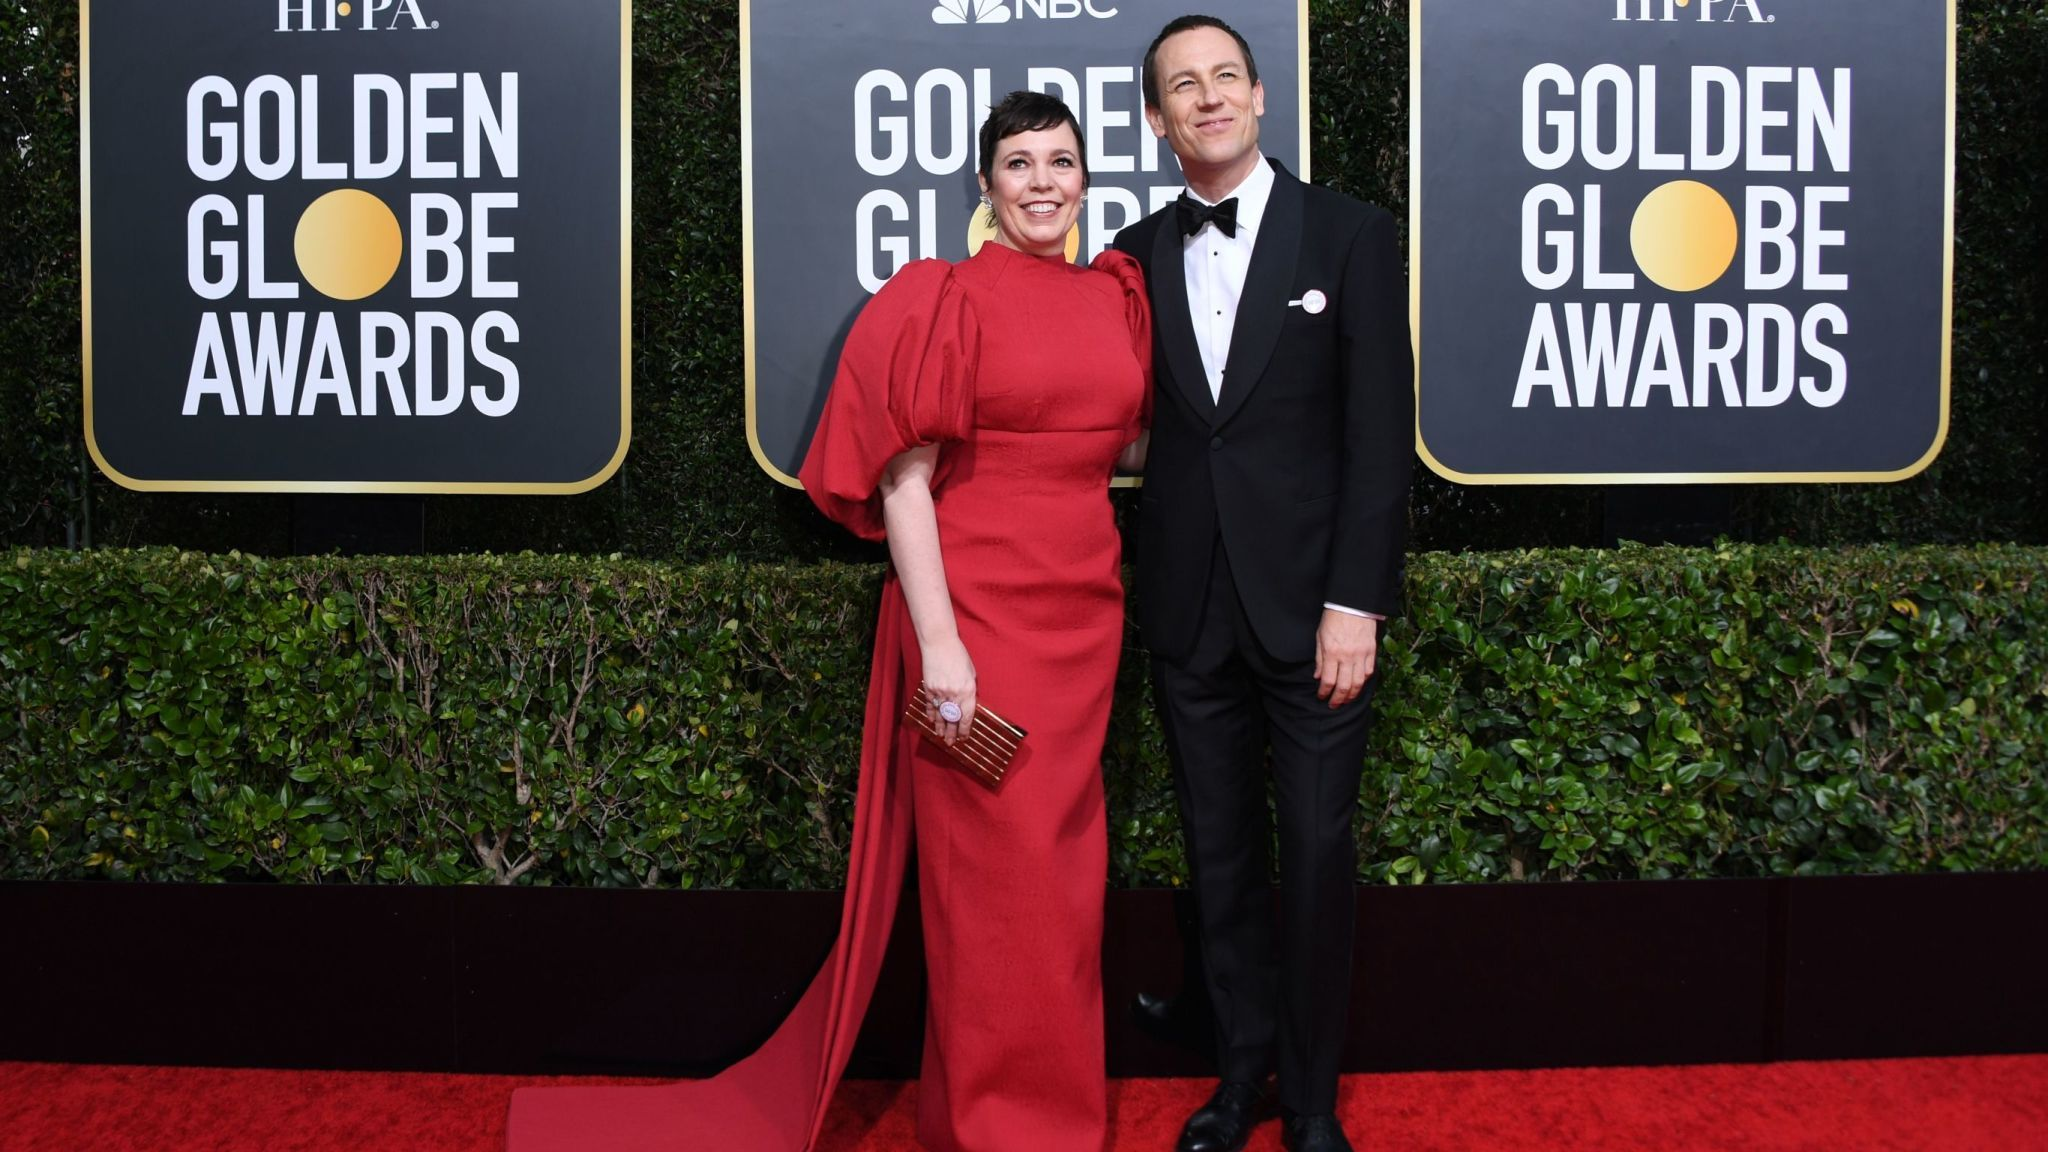 Golden Globes 2020 - Olivia Colman and Tobias Menzies